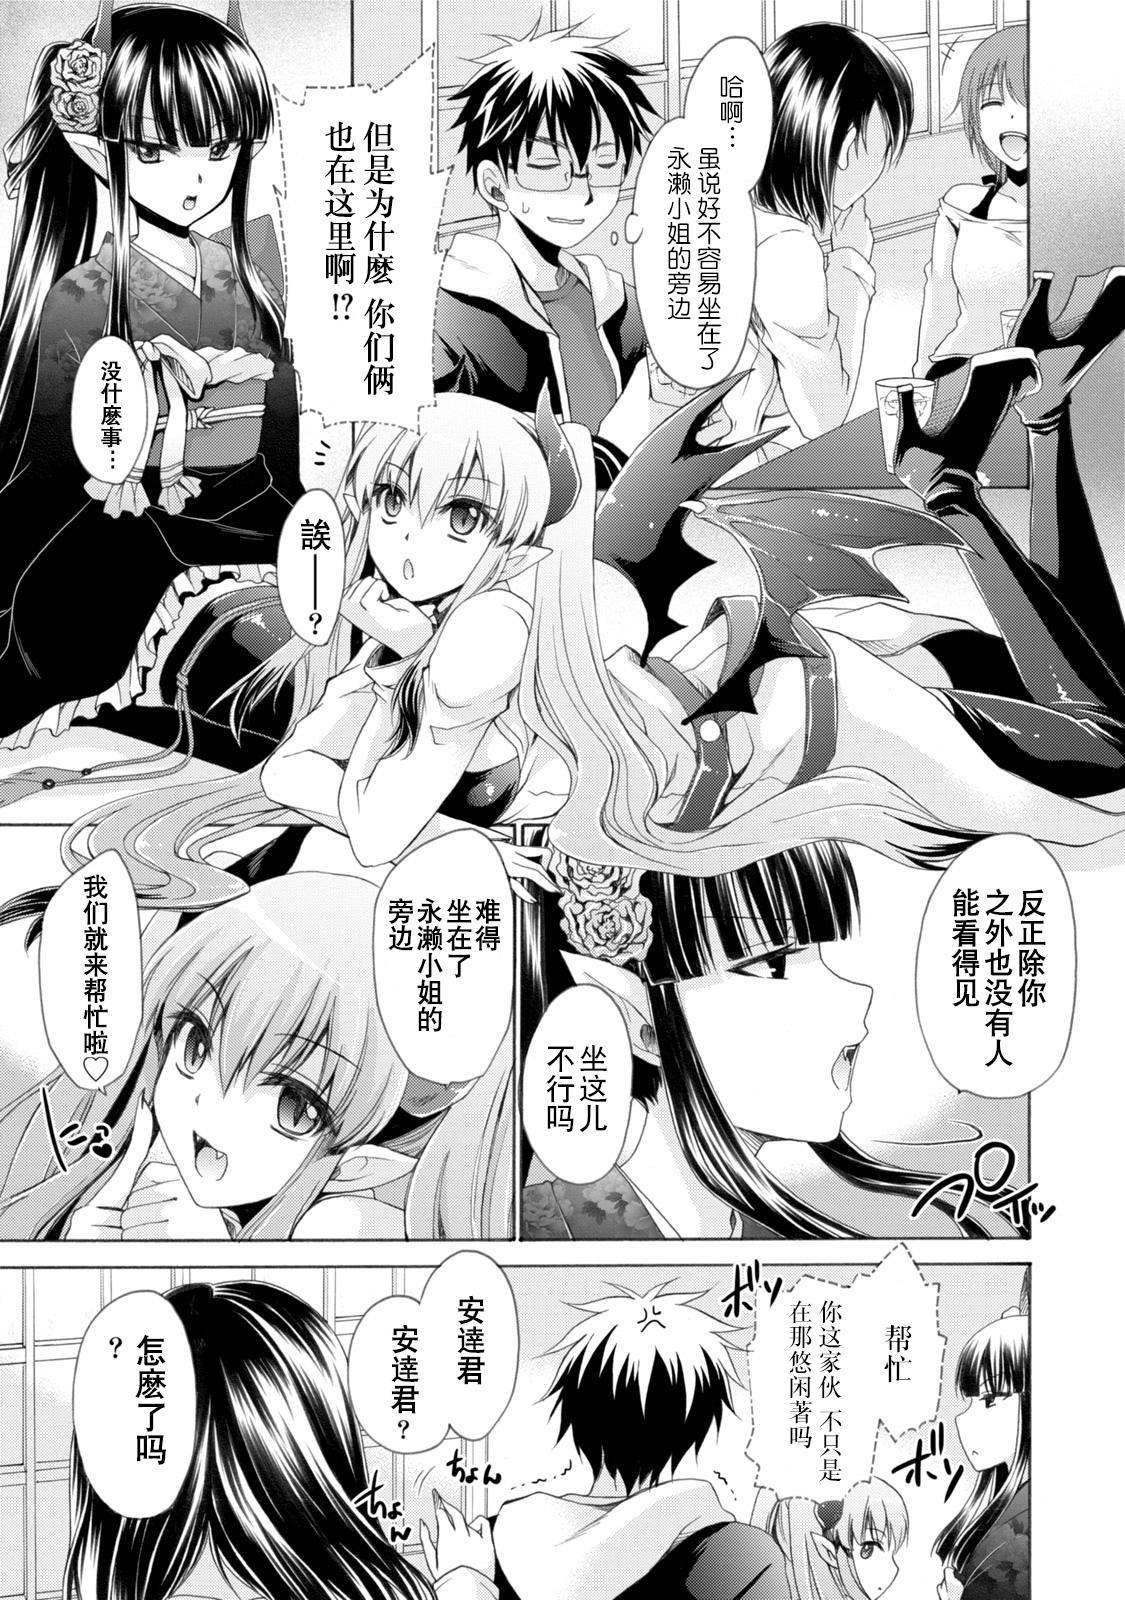 [Shinonome Ryu] Ore to Kanojo to Owaru Sekai - World's end LoveStory 1-5 [Chinese] [爱弹幕汉化组] [Digital] 54